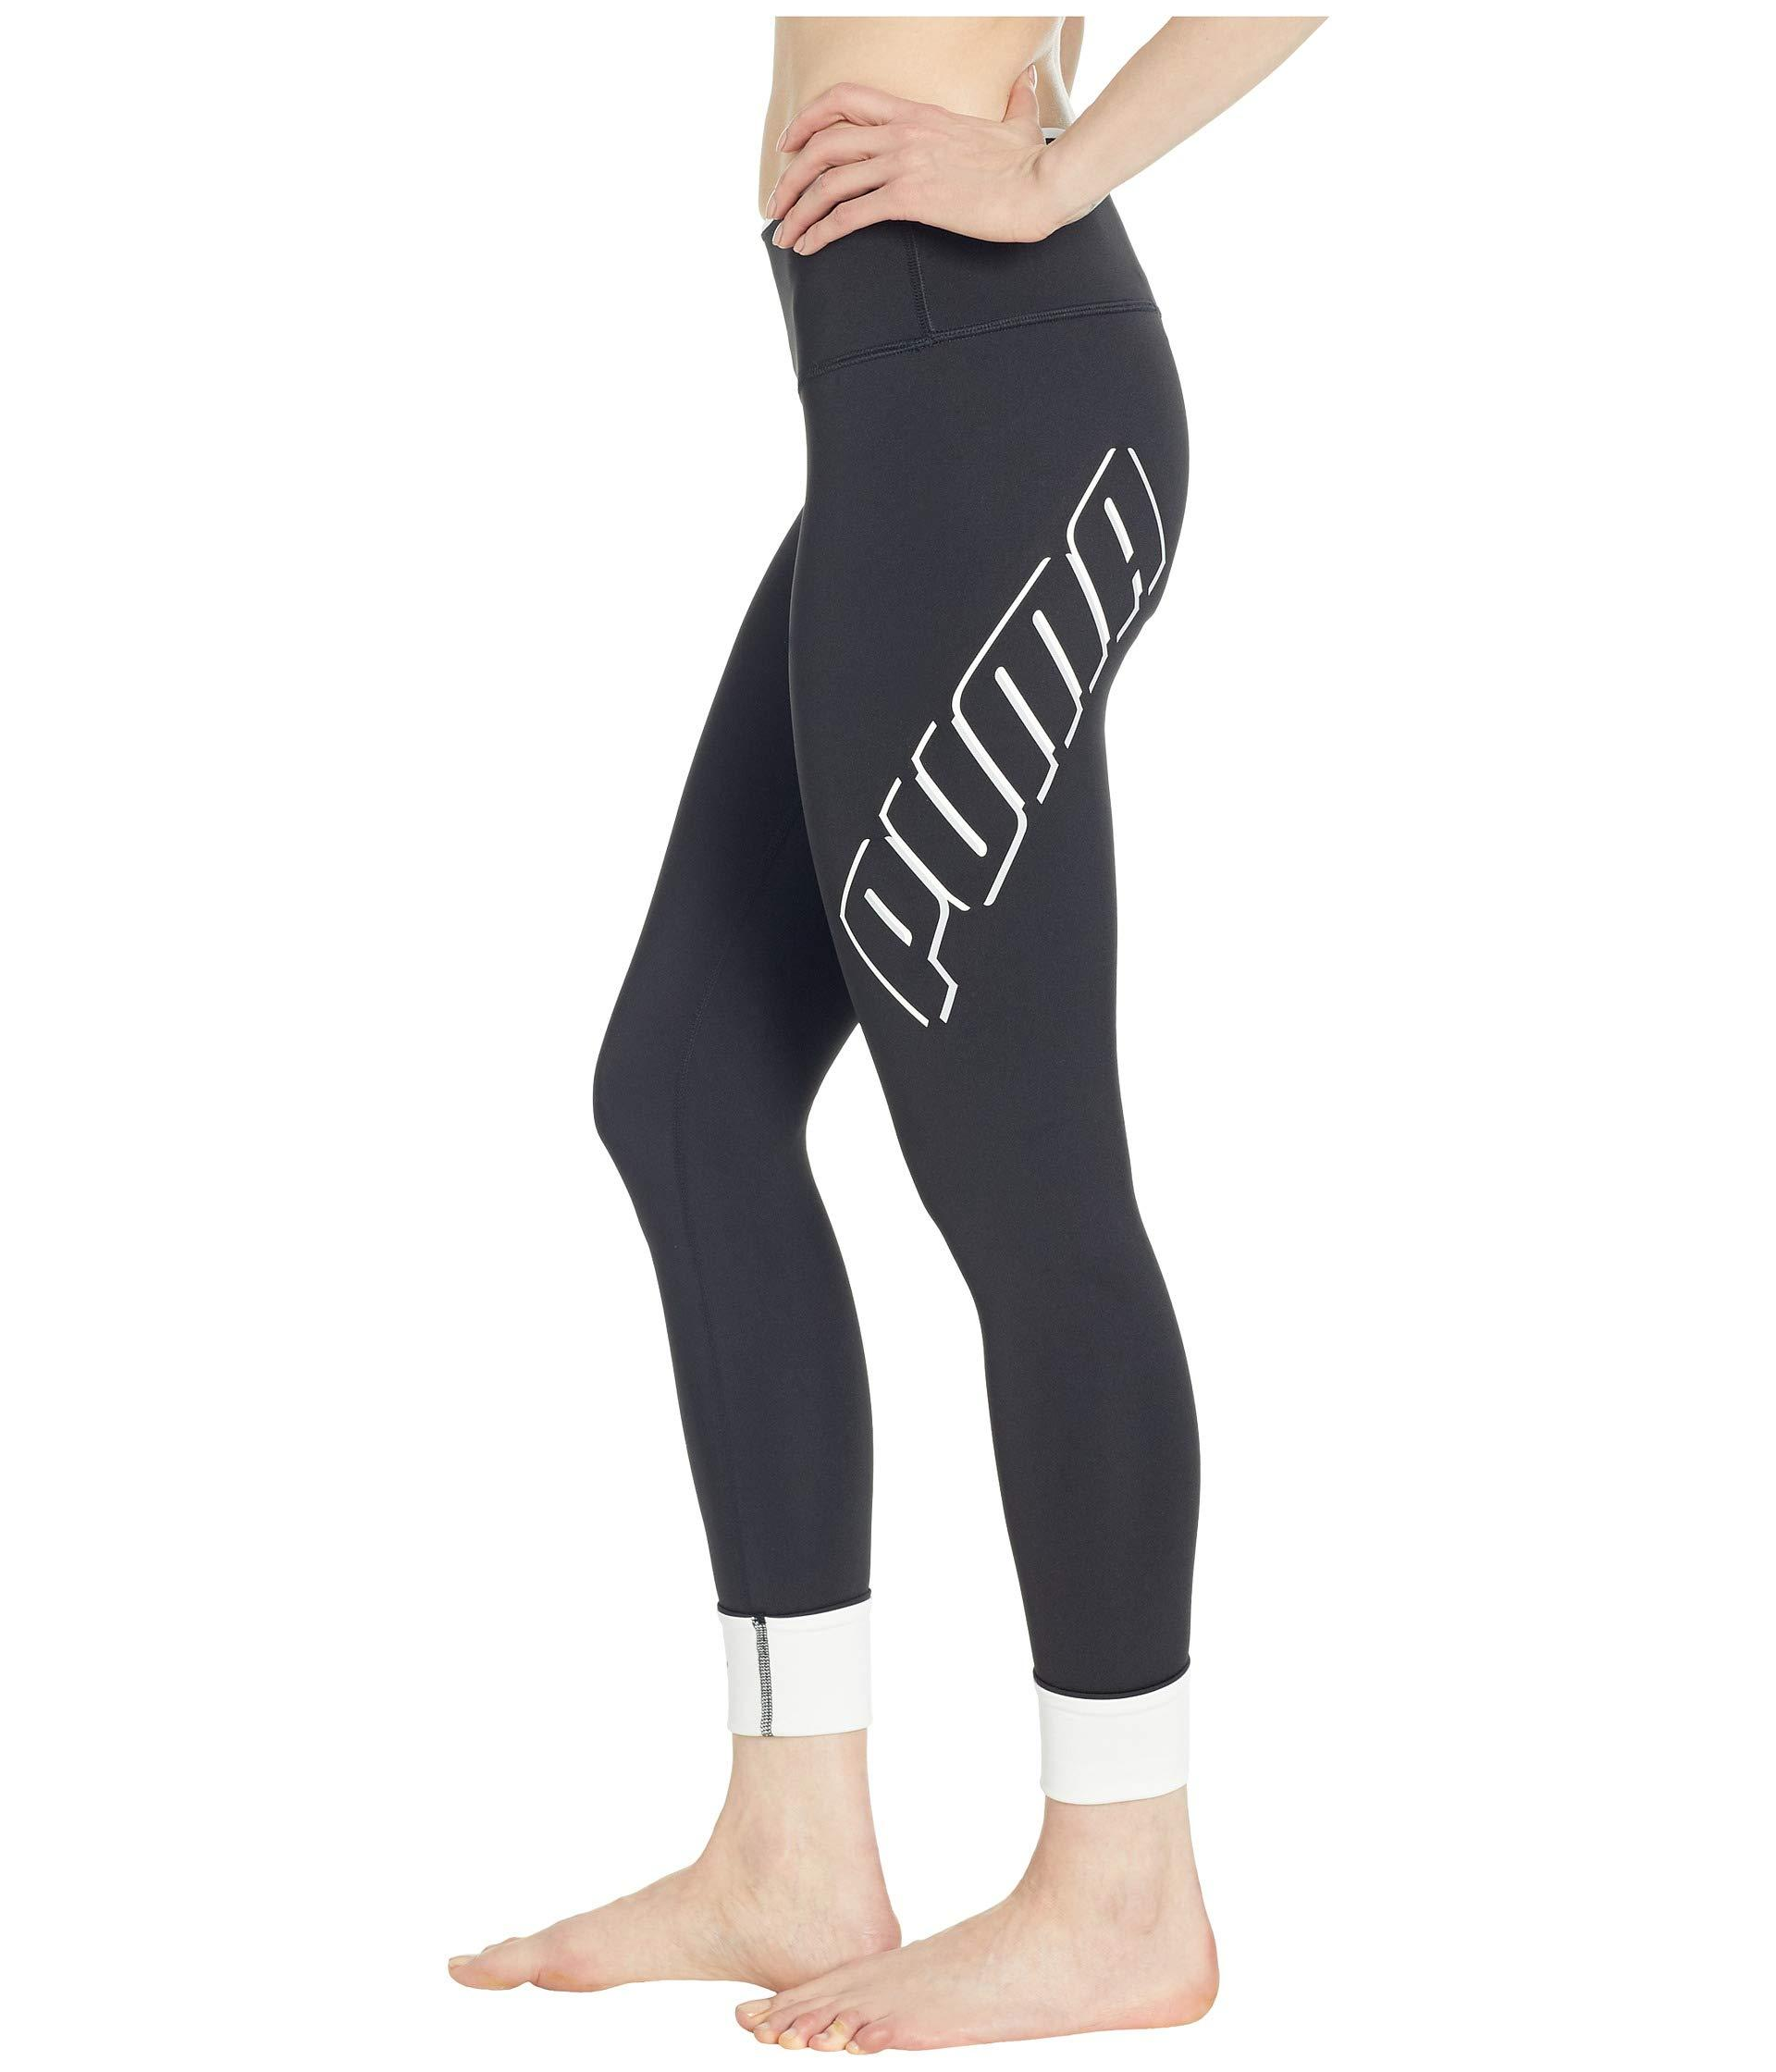 ae9360ebce4b59 Lyst - PUMA Modern Sports Fold Up Leggings in Black